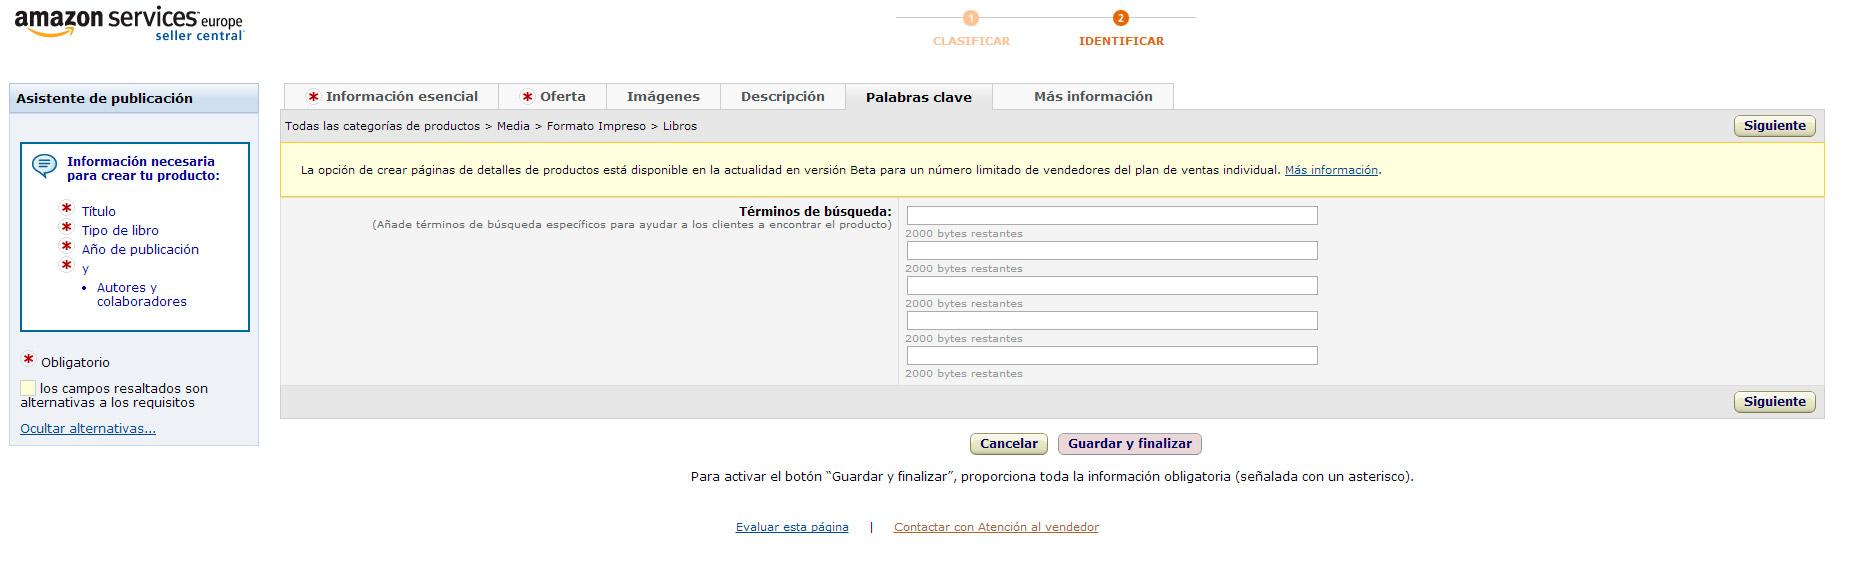 amazon15